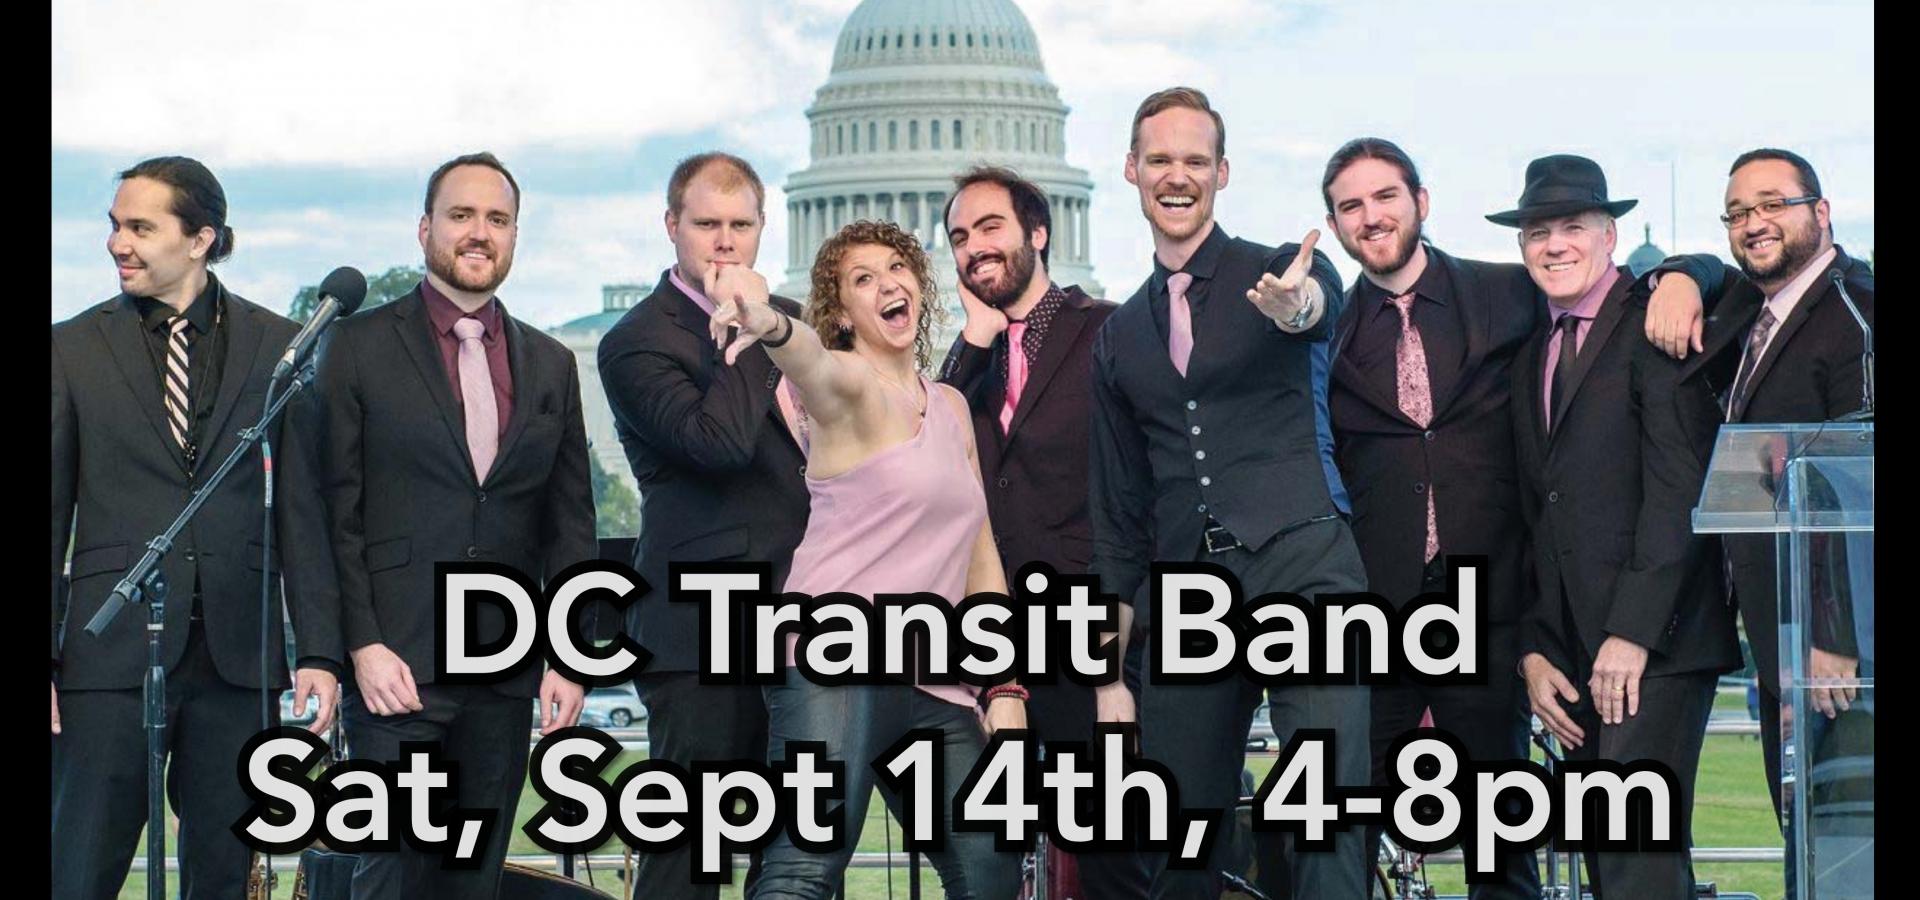 DC Transit Band Web Pic